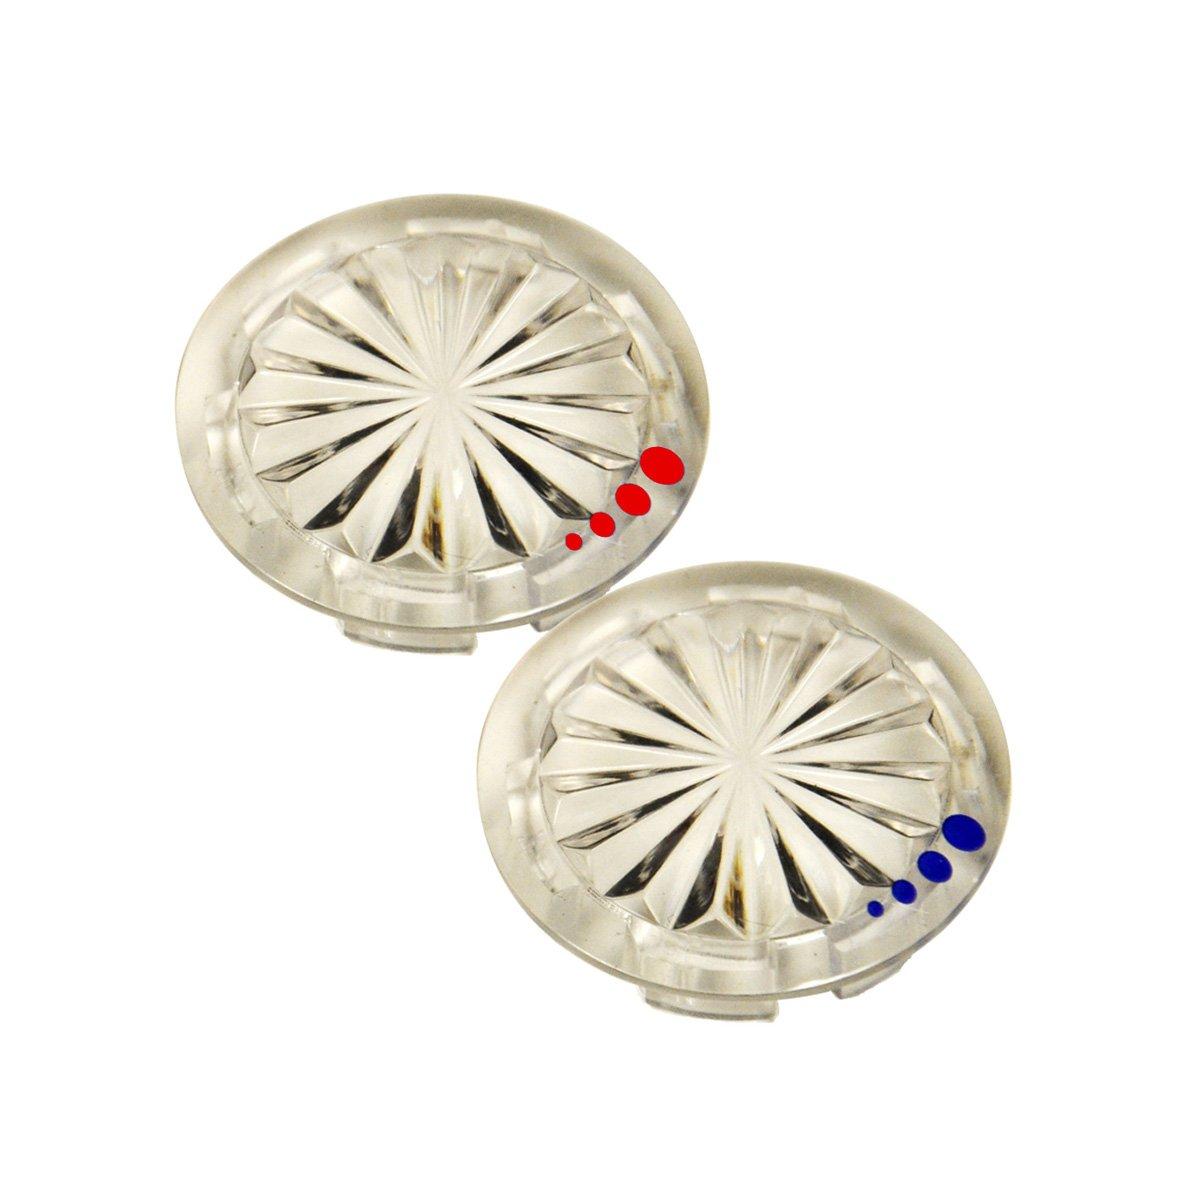 Danco 89958 Index Buttons for Glacier Bay Faucet Handles Clear